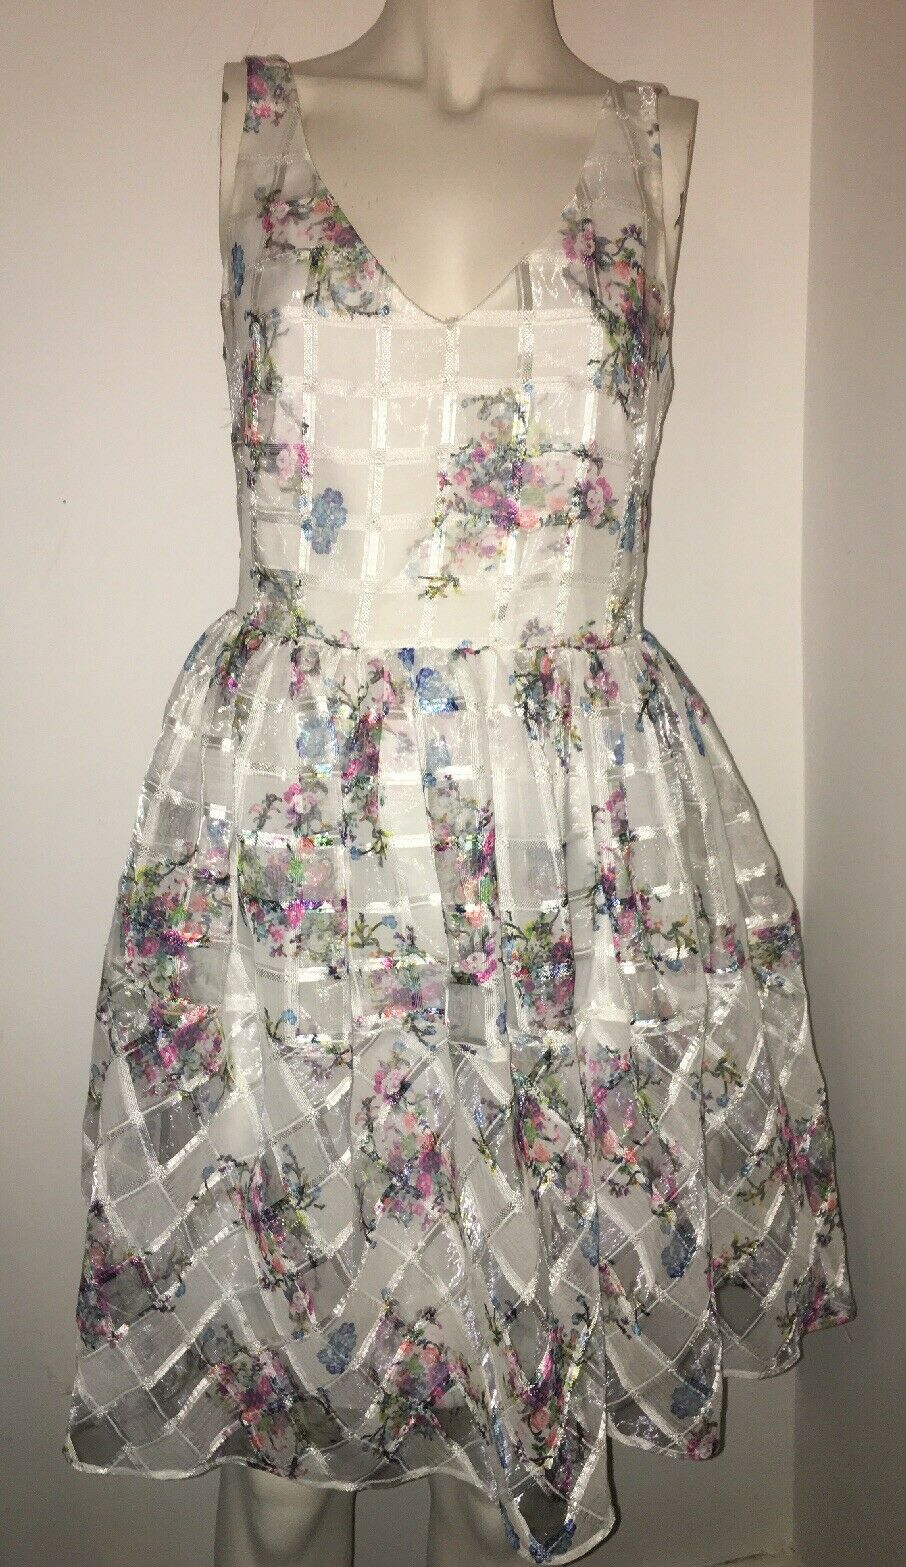 NEW Anthropologie Maeve Sheer Floral Trellis Print Fit Flare Dress Wedding